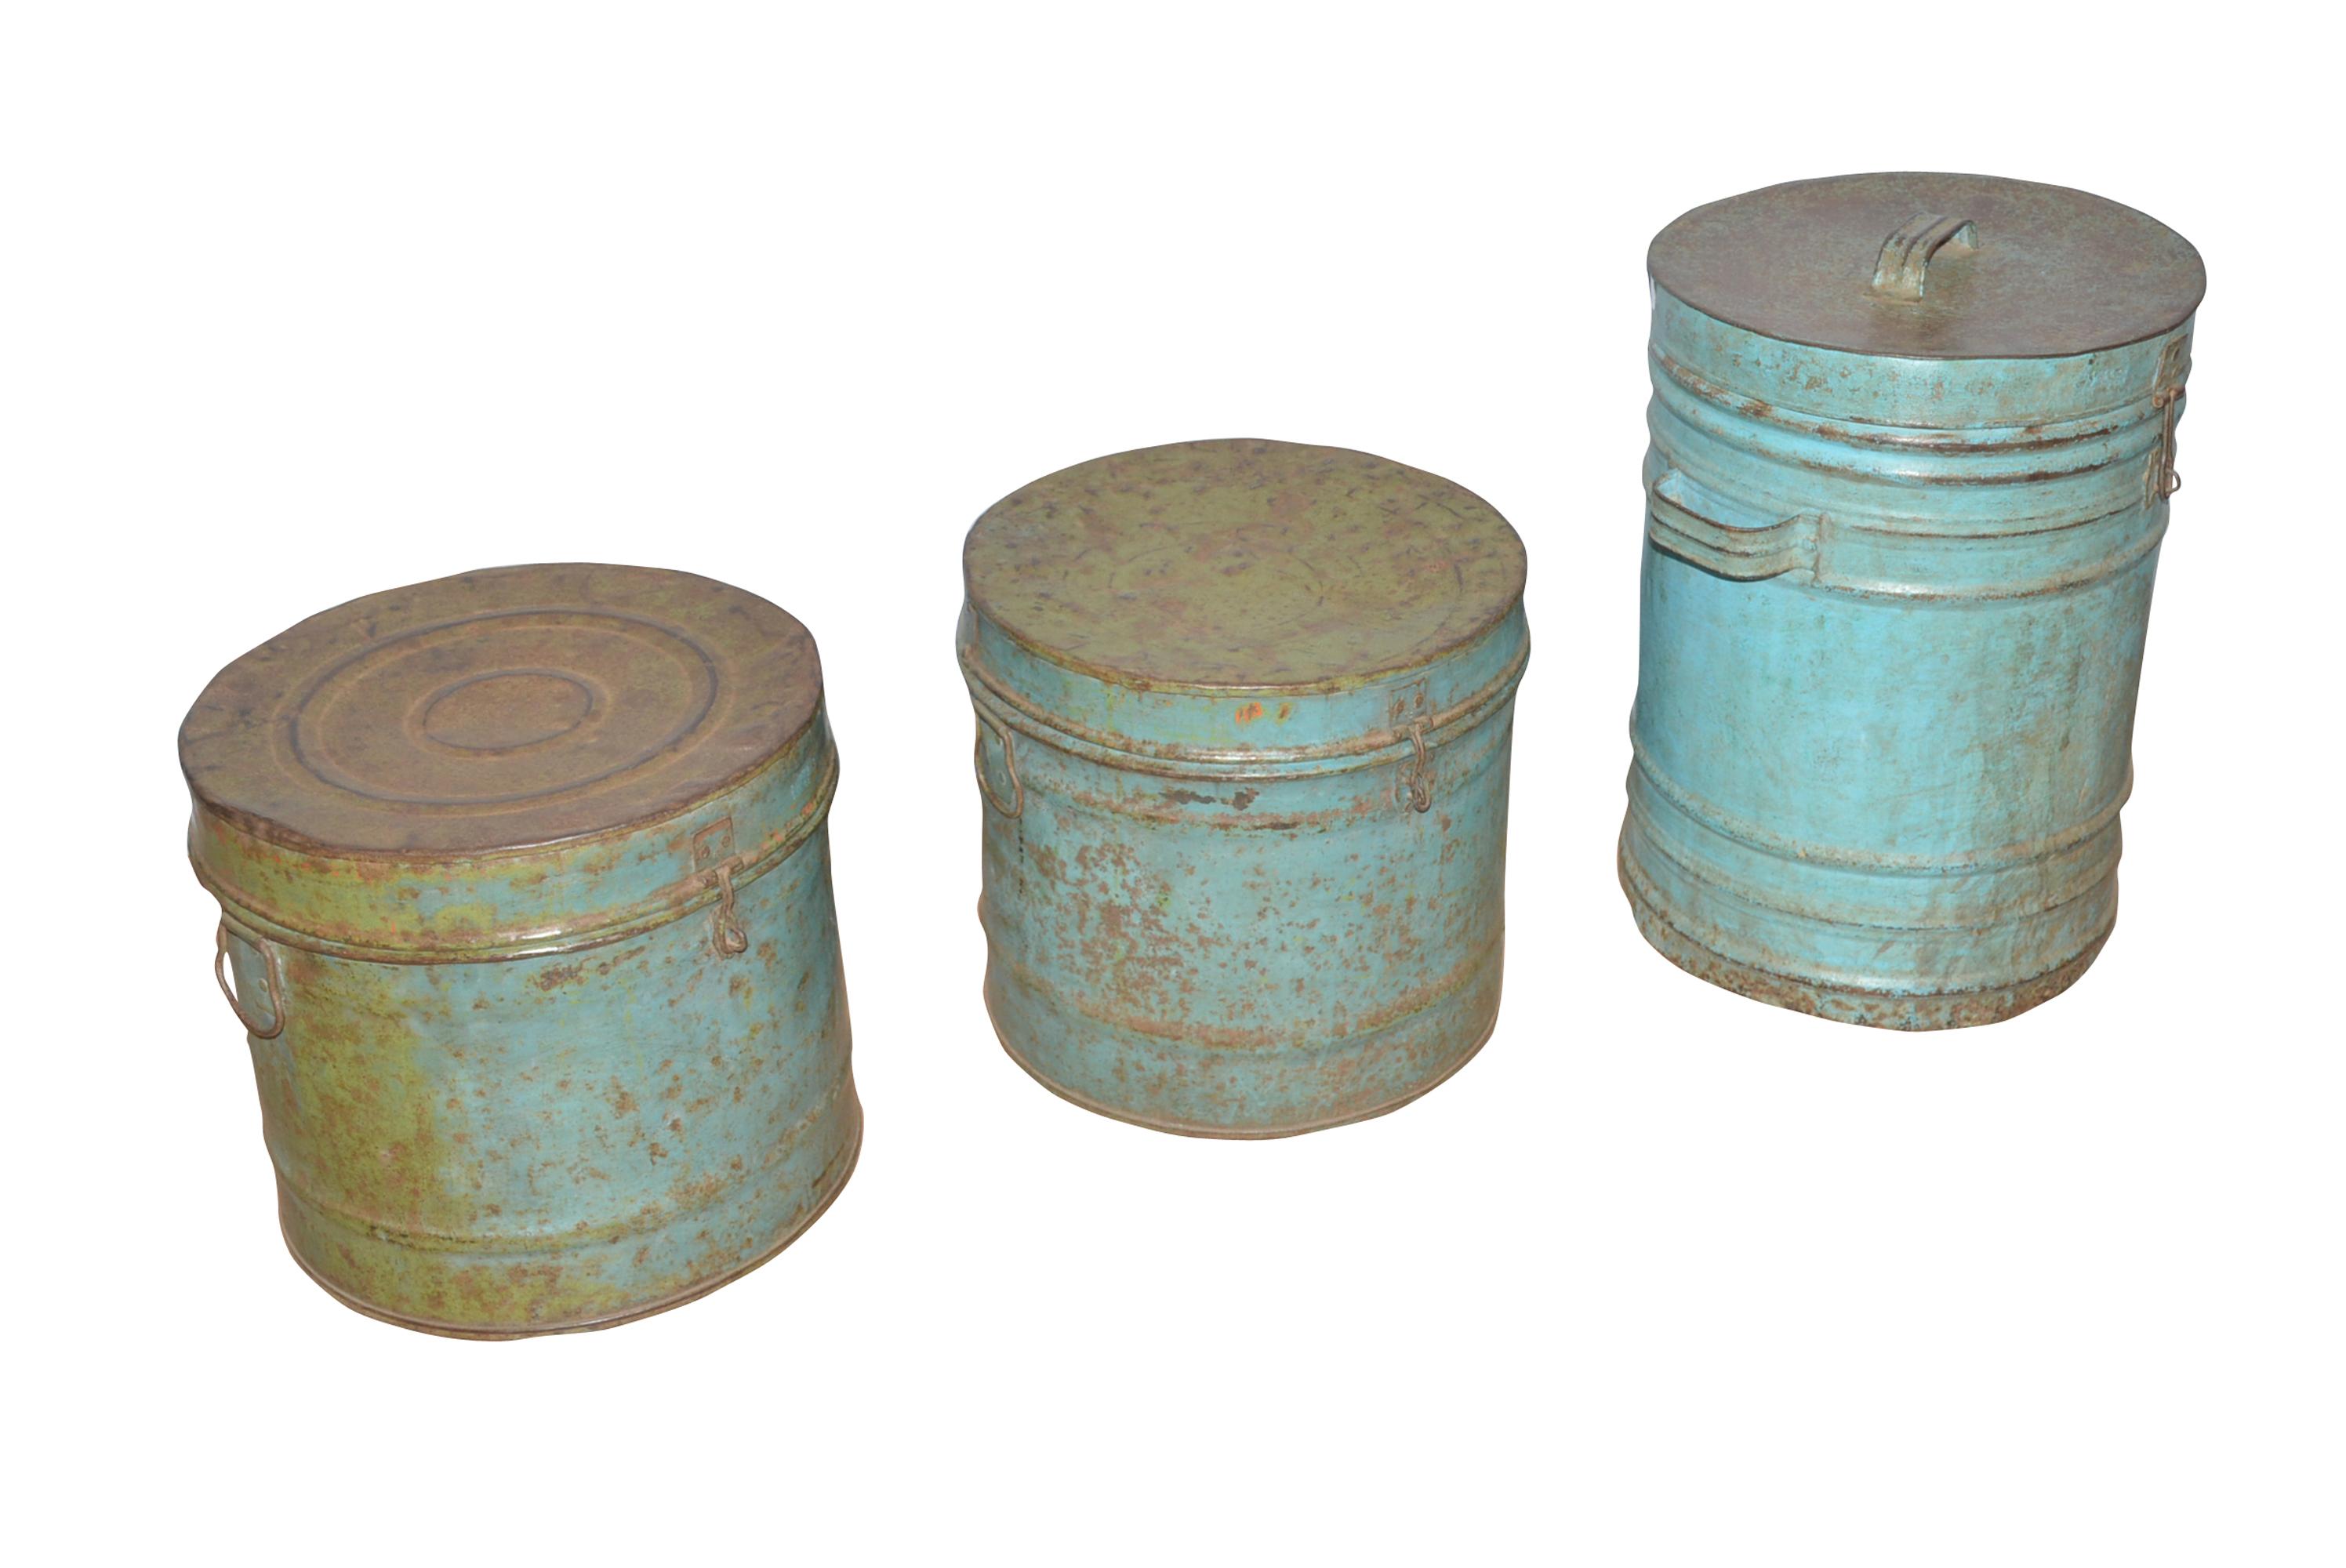 ANRA1505 - 40 X 40 x 40 cm